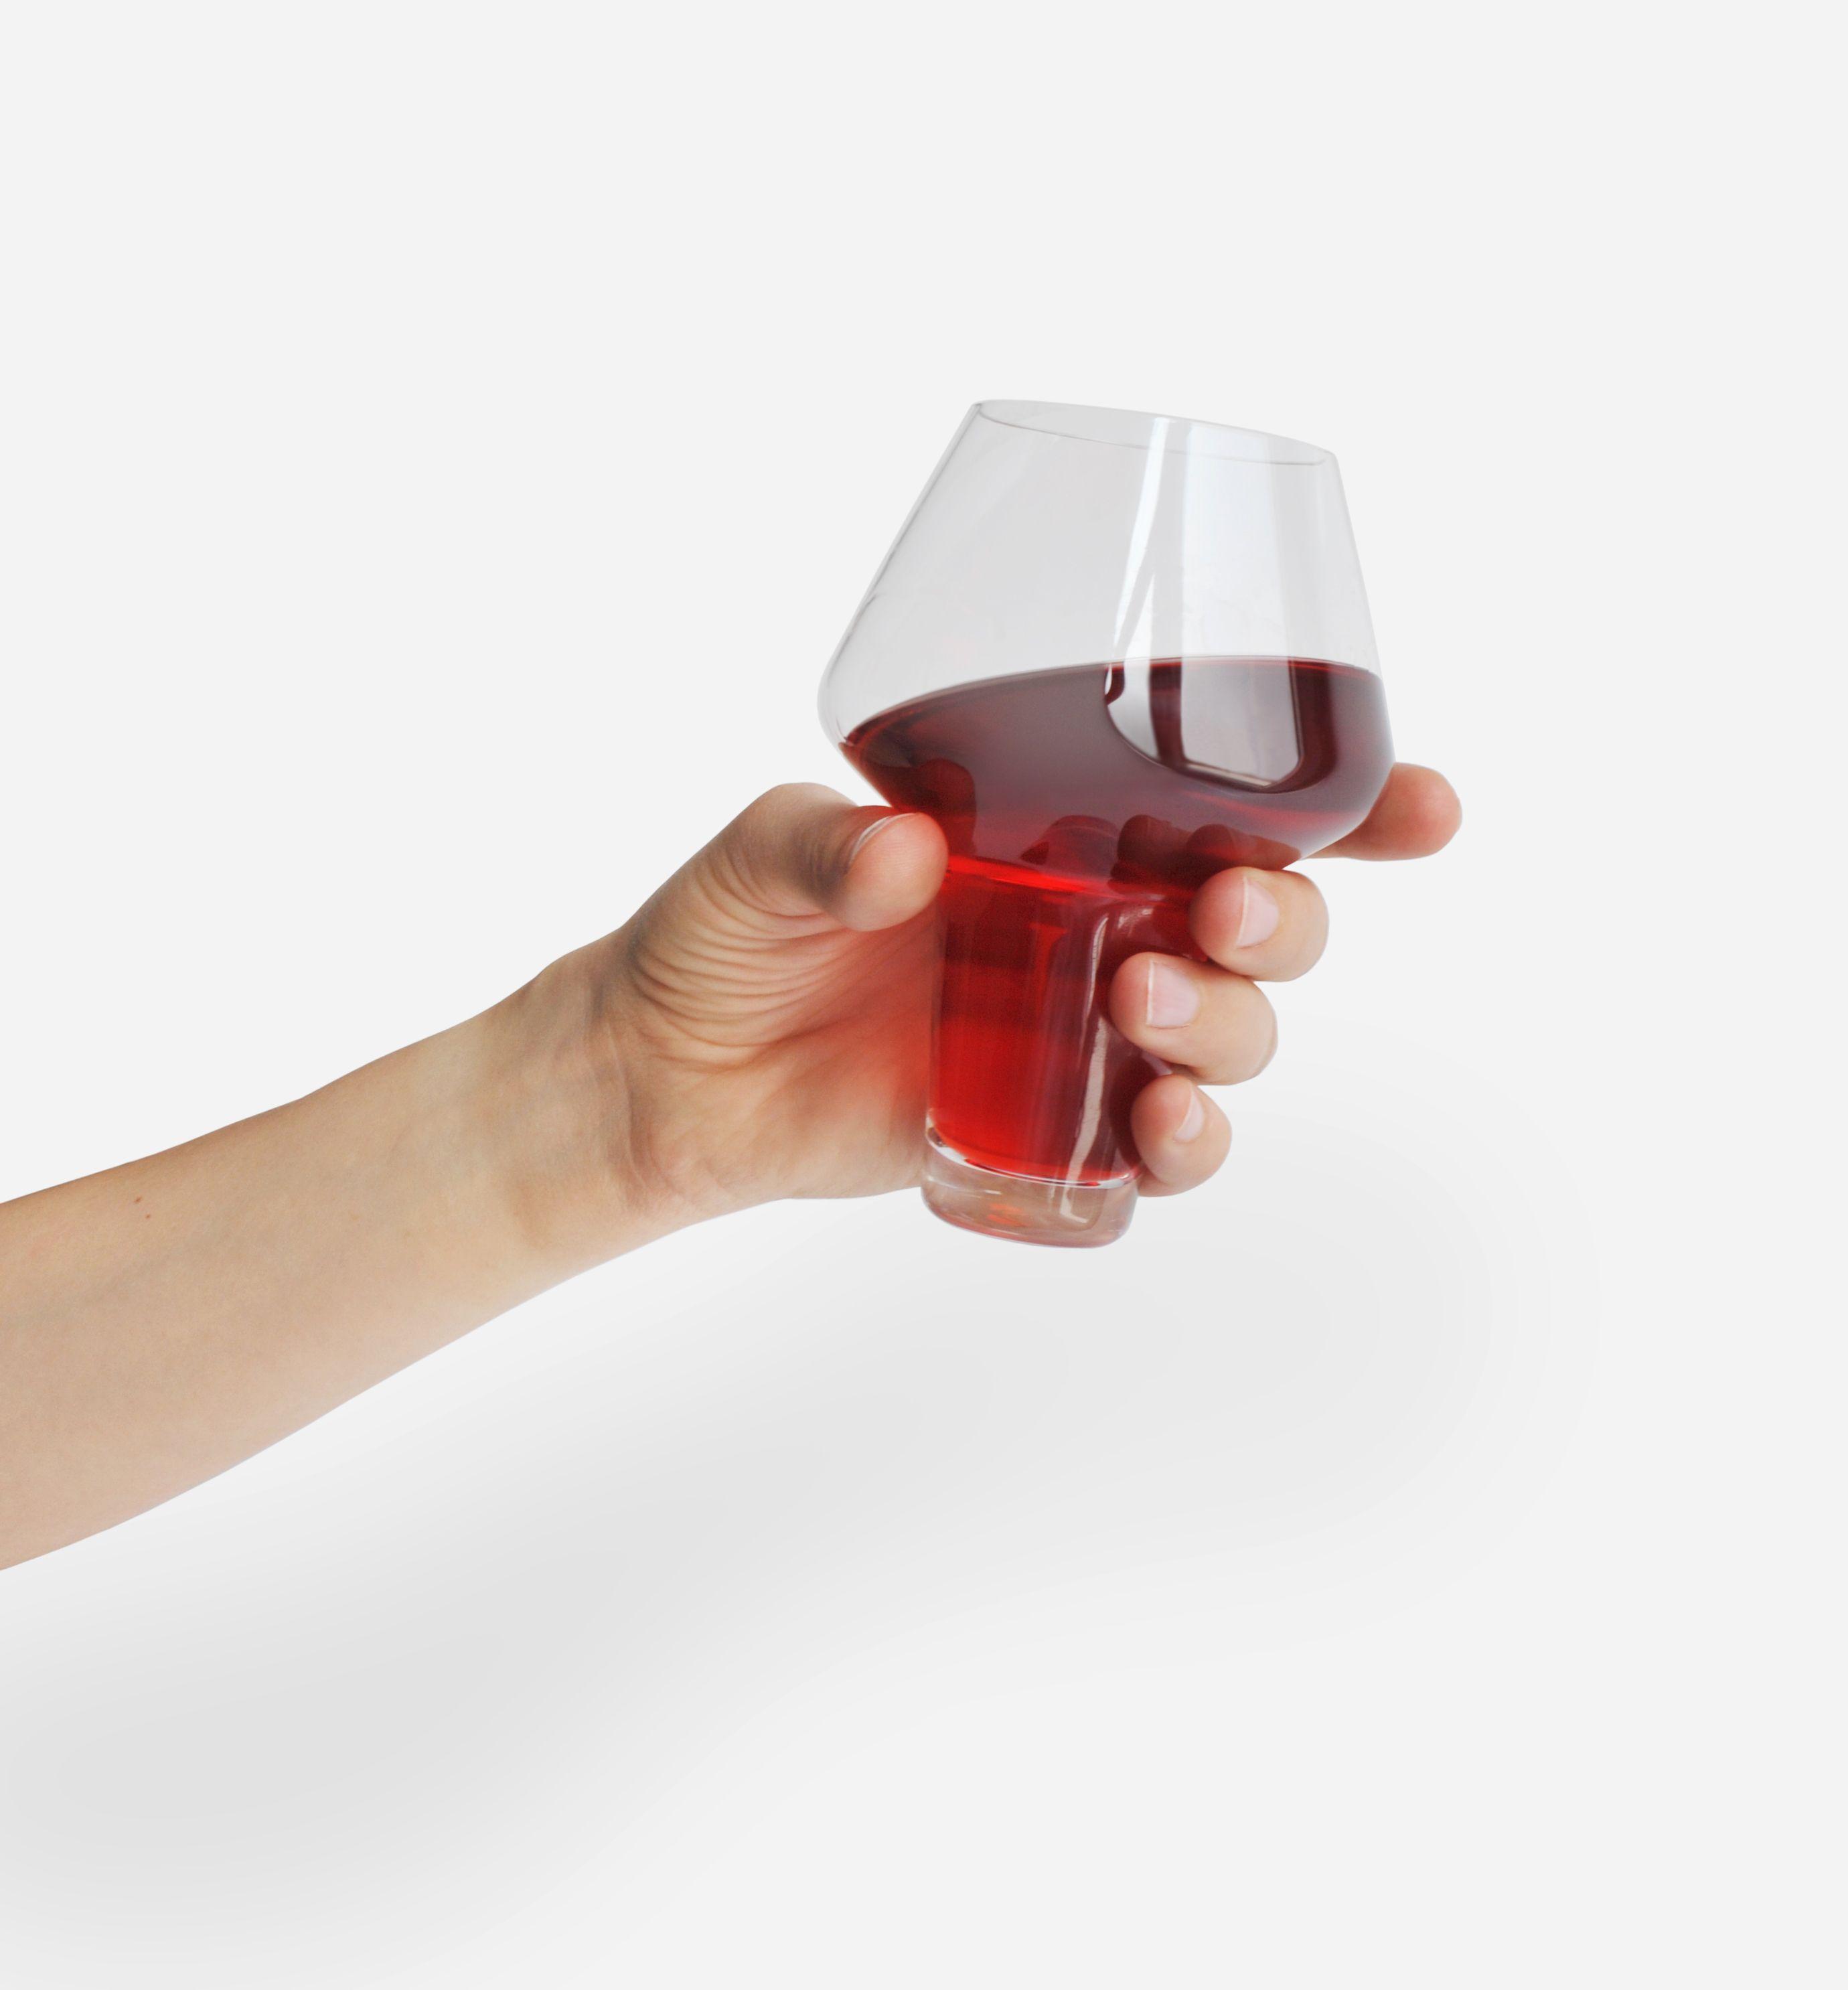 Thomas Feichtner Making Of Reset Drinking Glass Series Stamm Austria 2009 Tableware Design Glass Design Ceramic Tableware